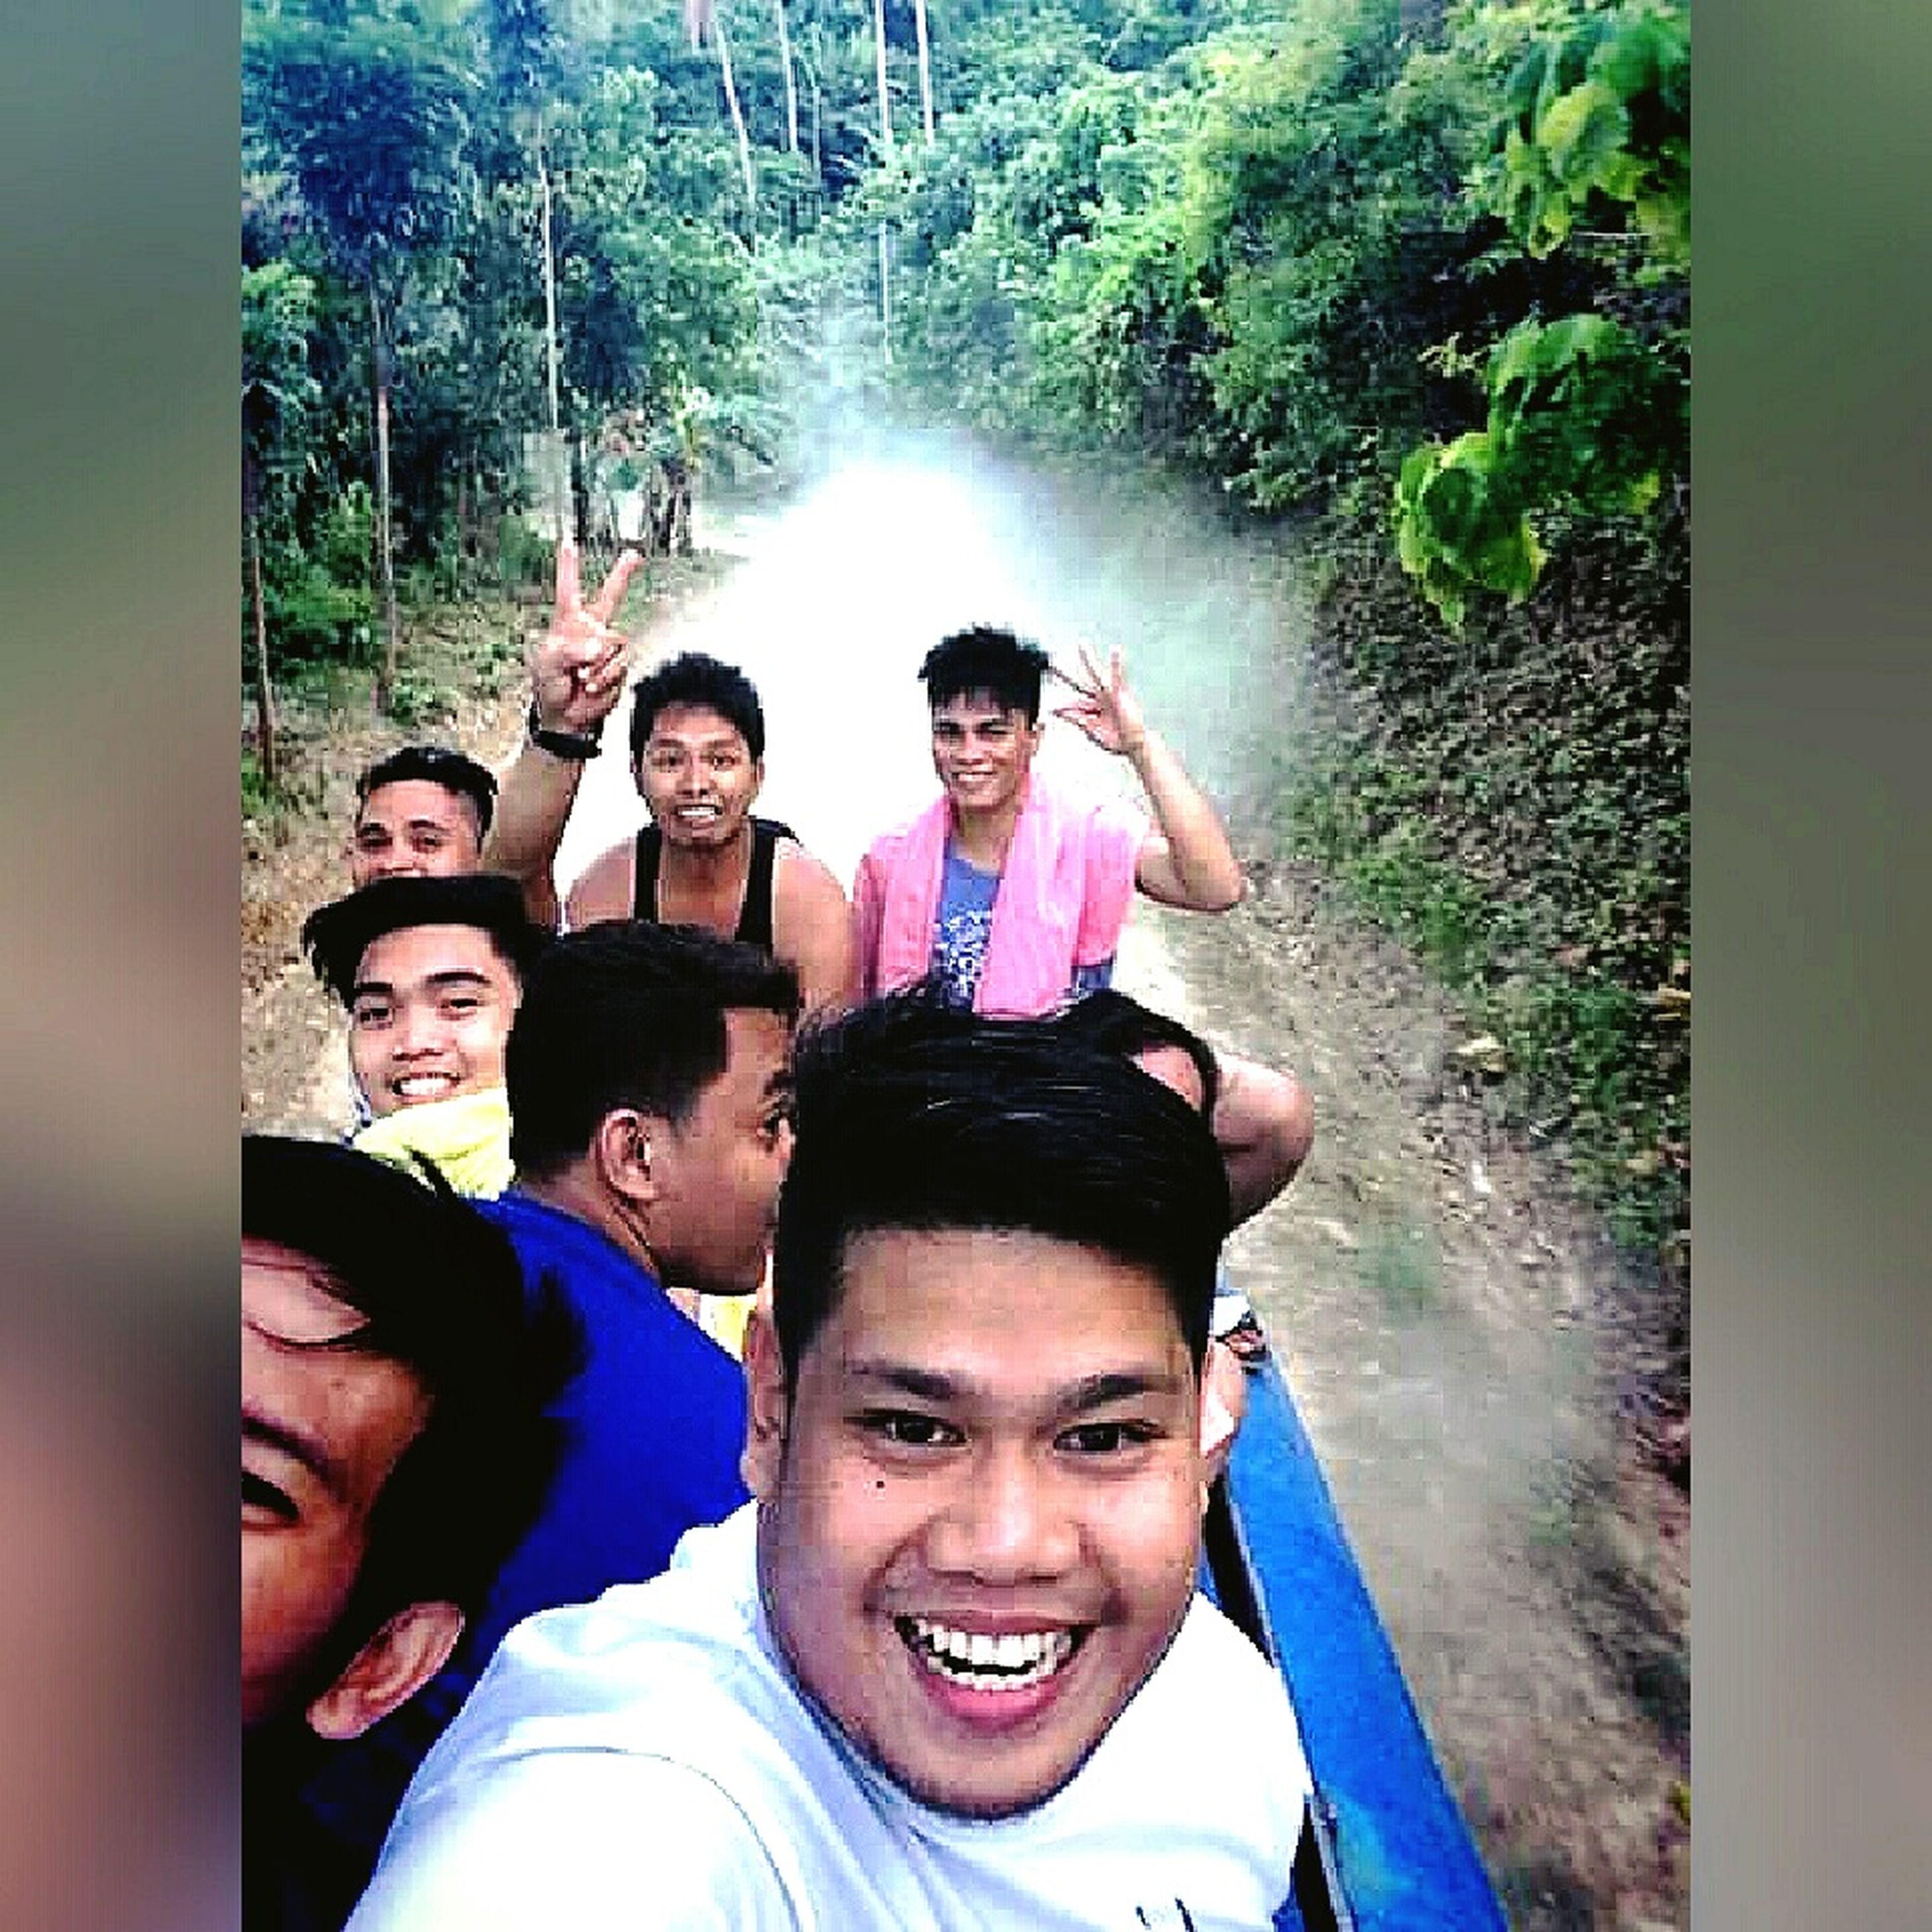 RePicture Friendship Happytrip Roofride Jeepney Travel Friends Happiness